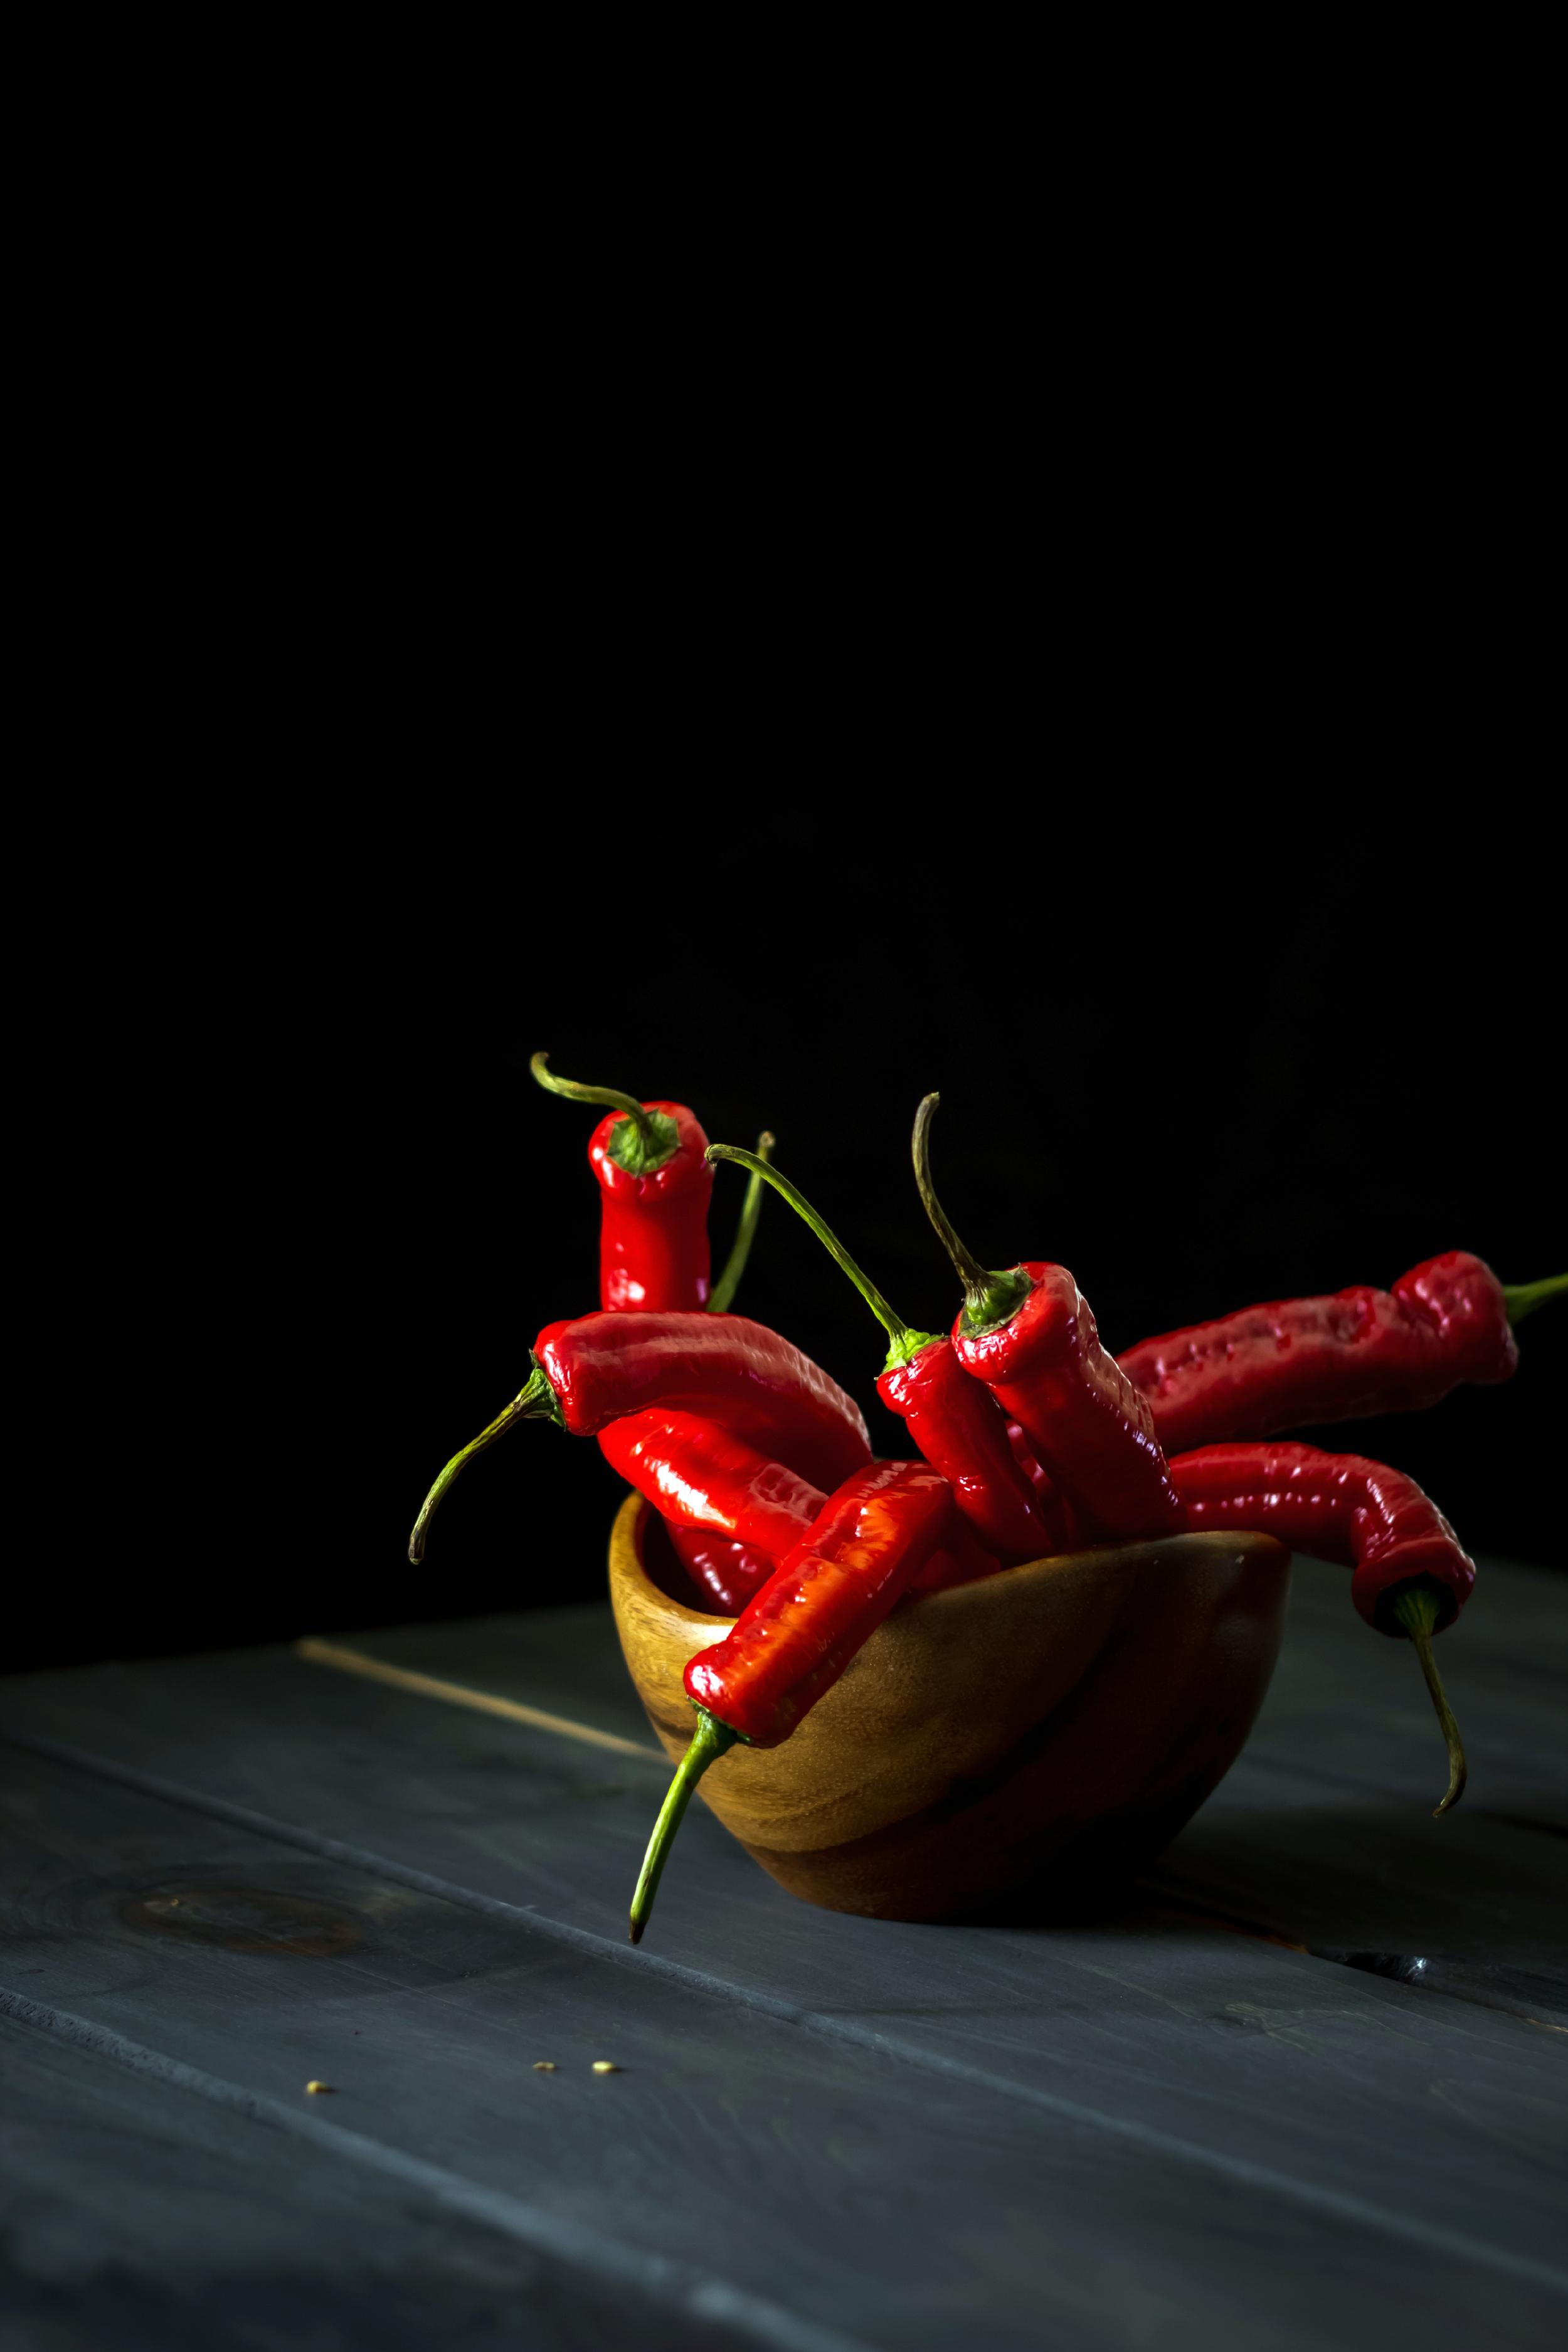 chili peppers1.1.jpg